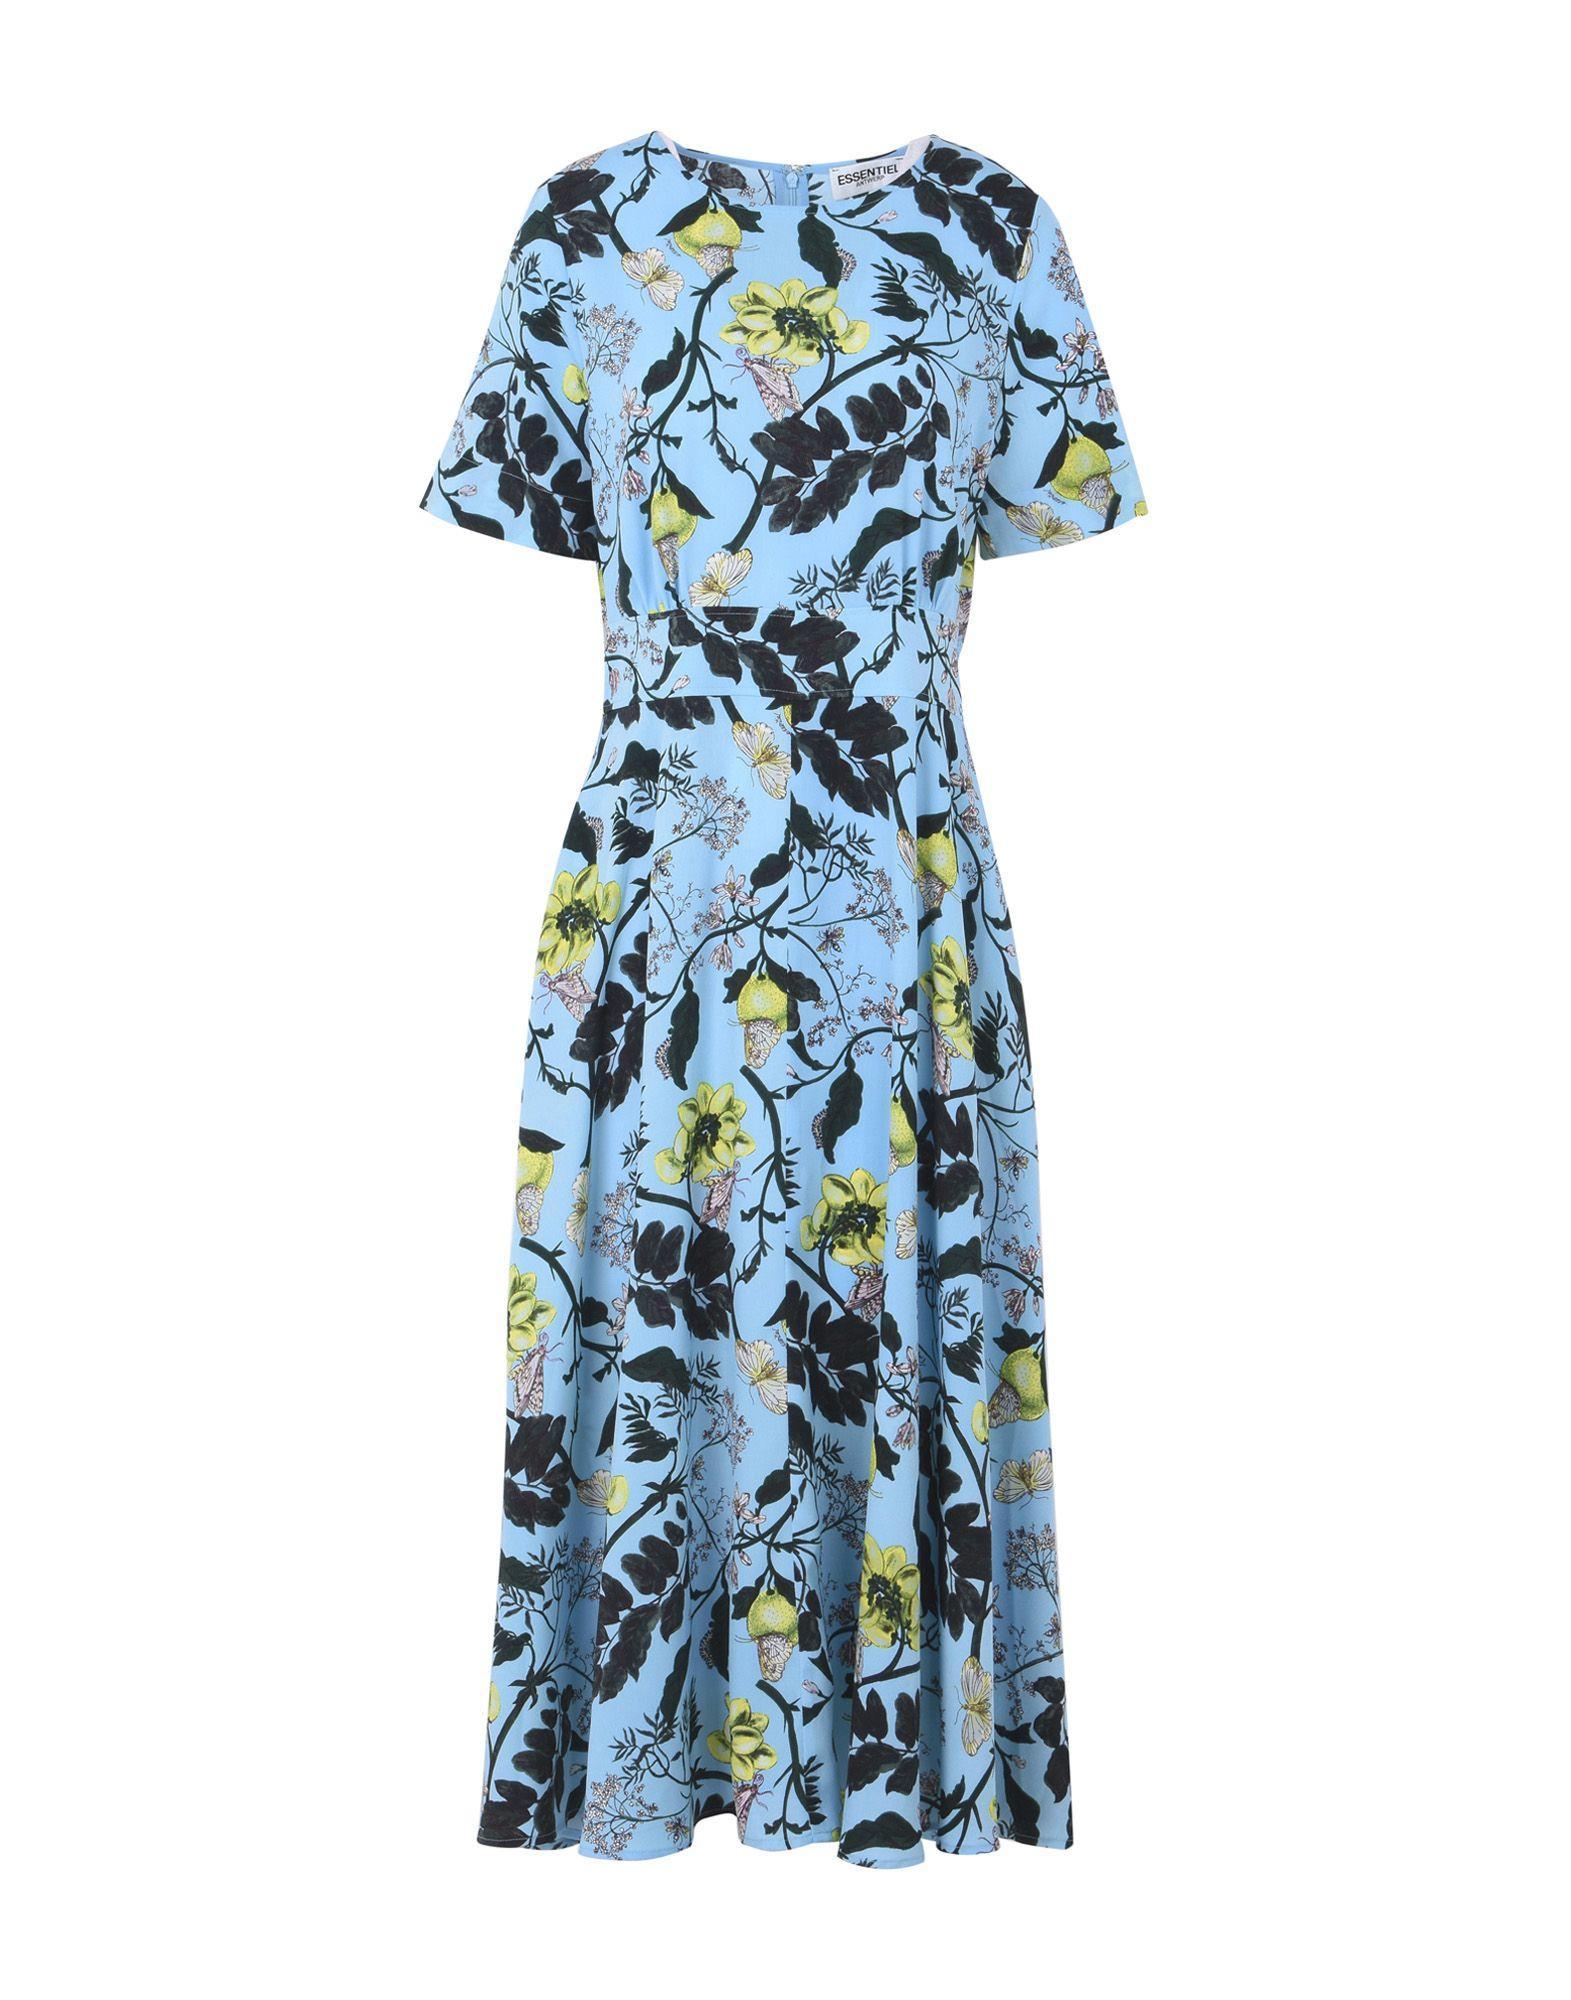 Essentiel Antwerp 3/4 Length Dresses In Turquoise